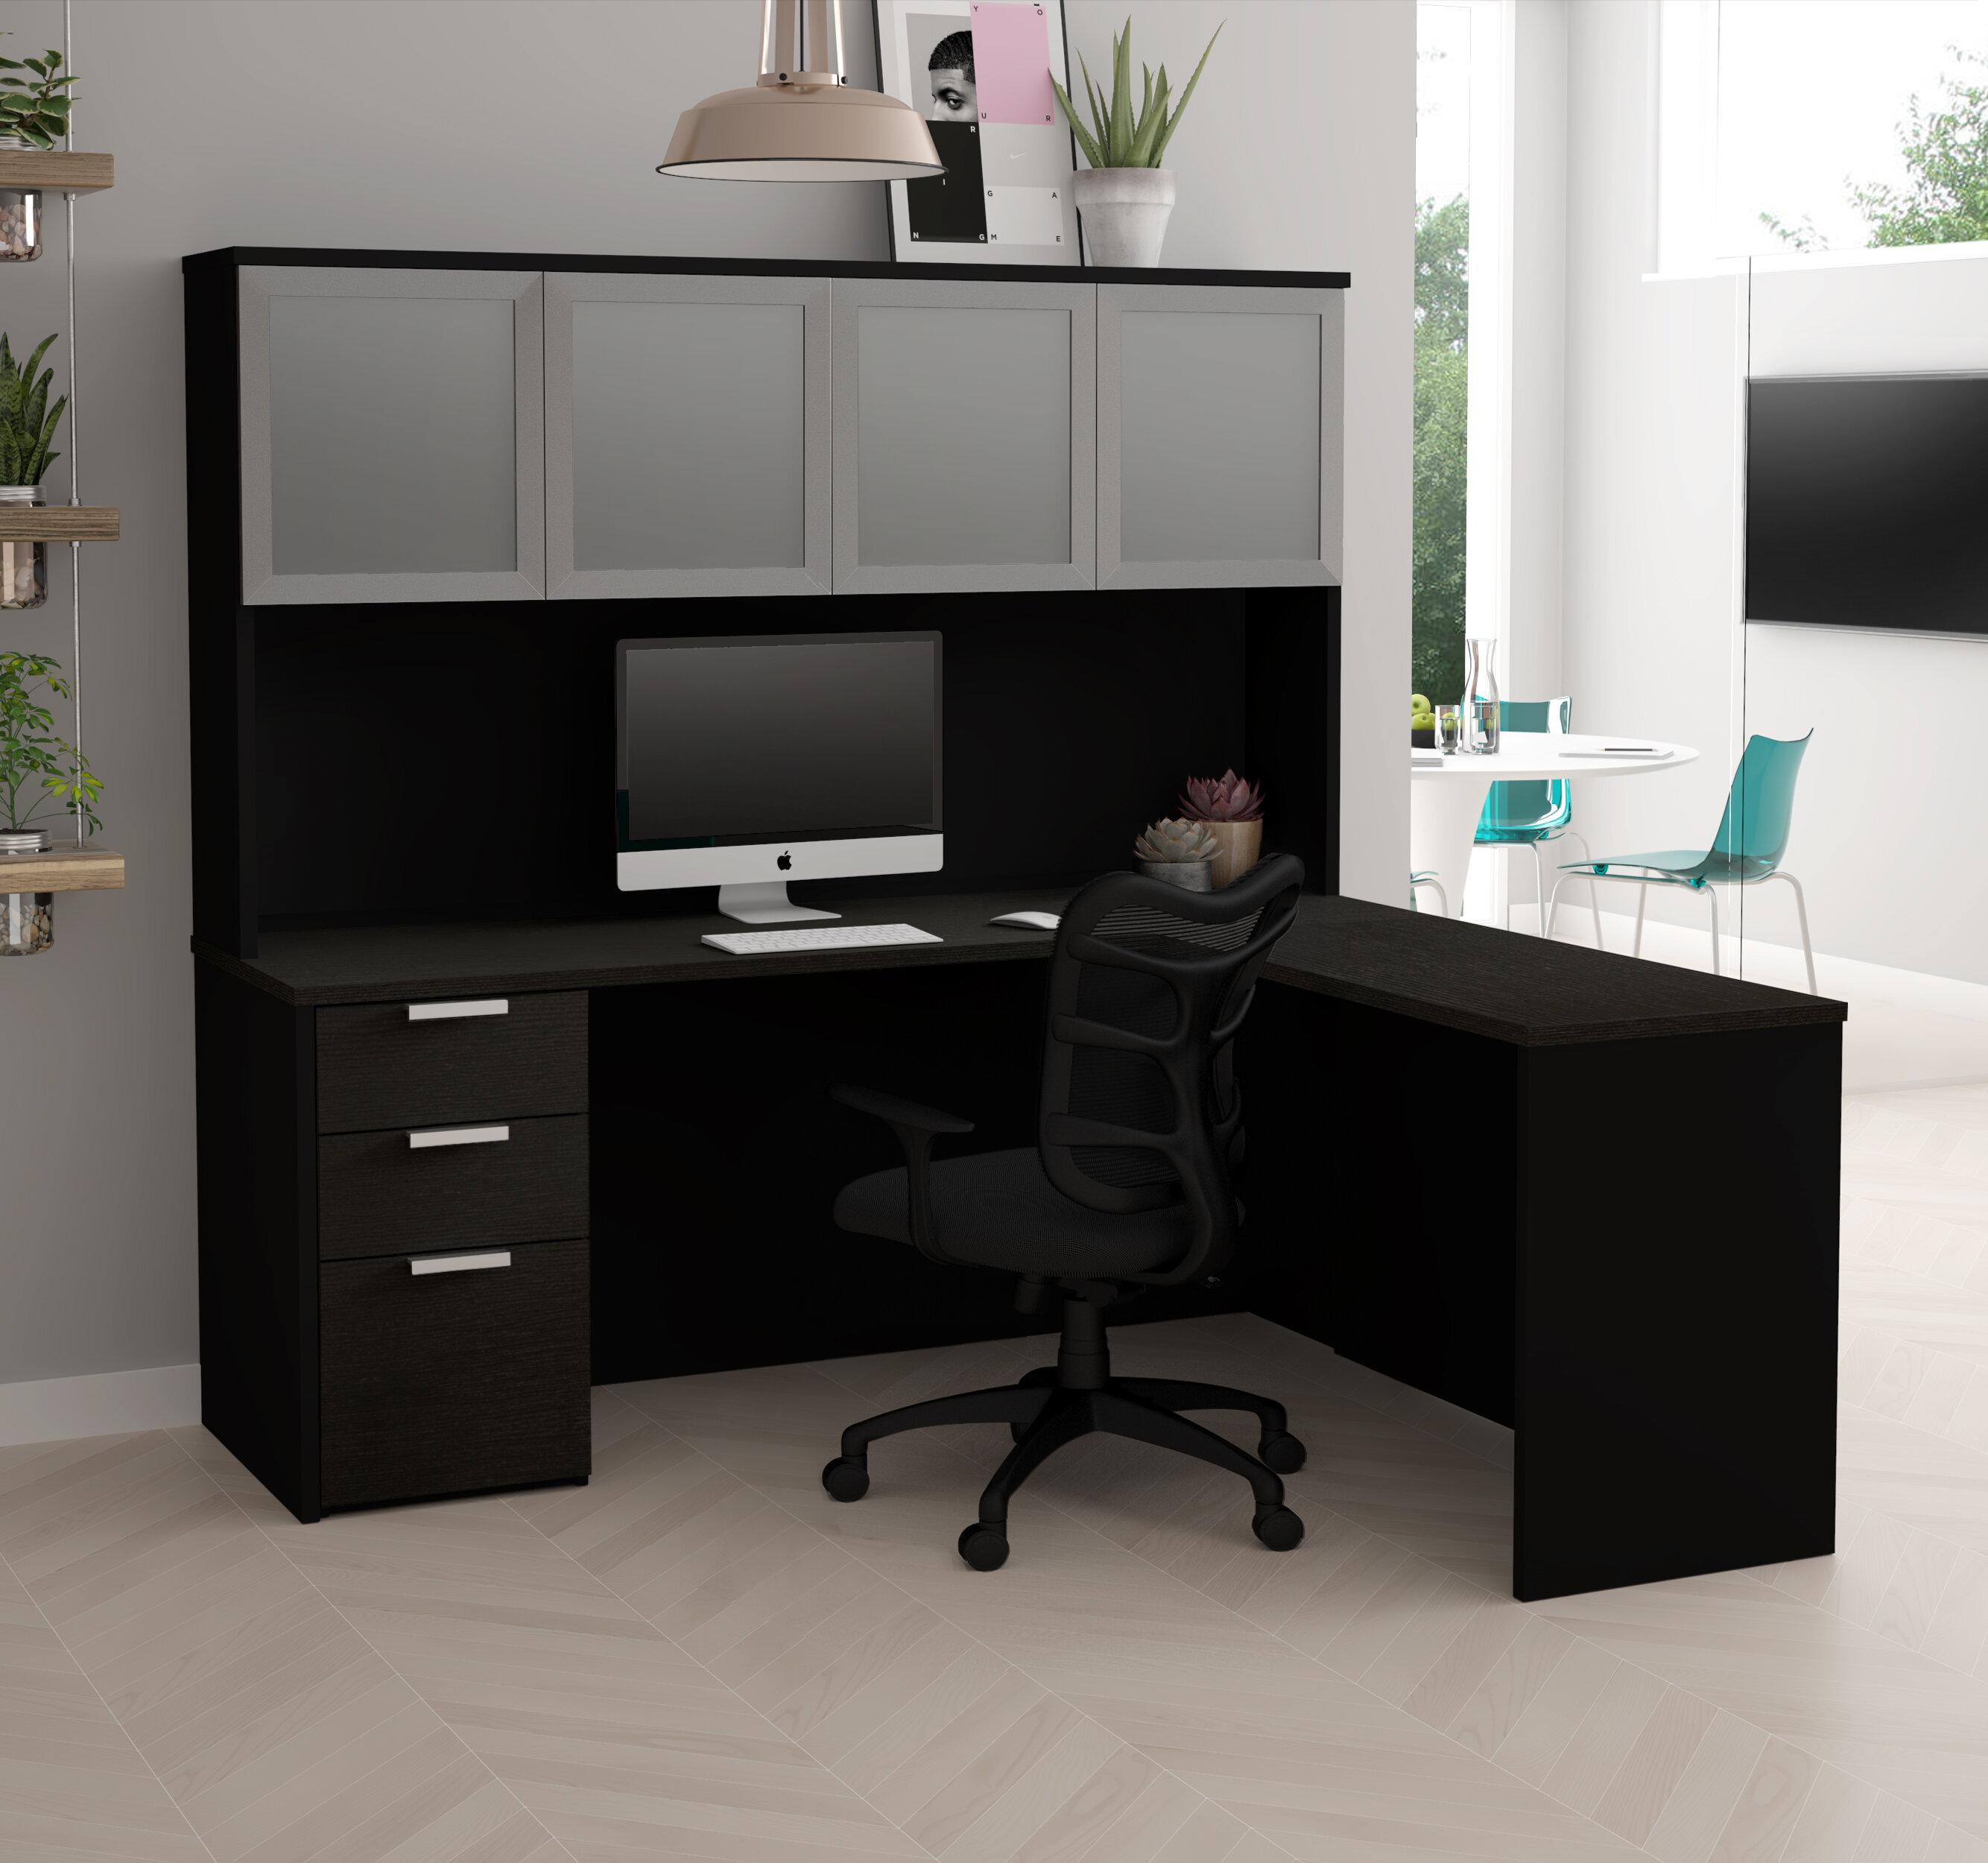 Hutch Large Desks You Ll Love In 2020 Wayfair